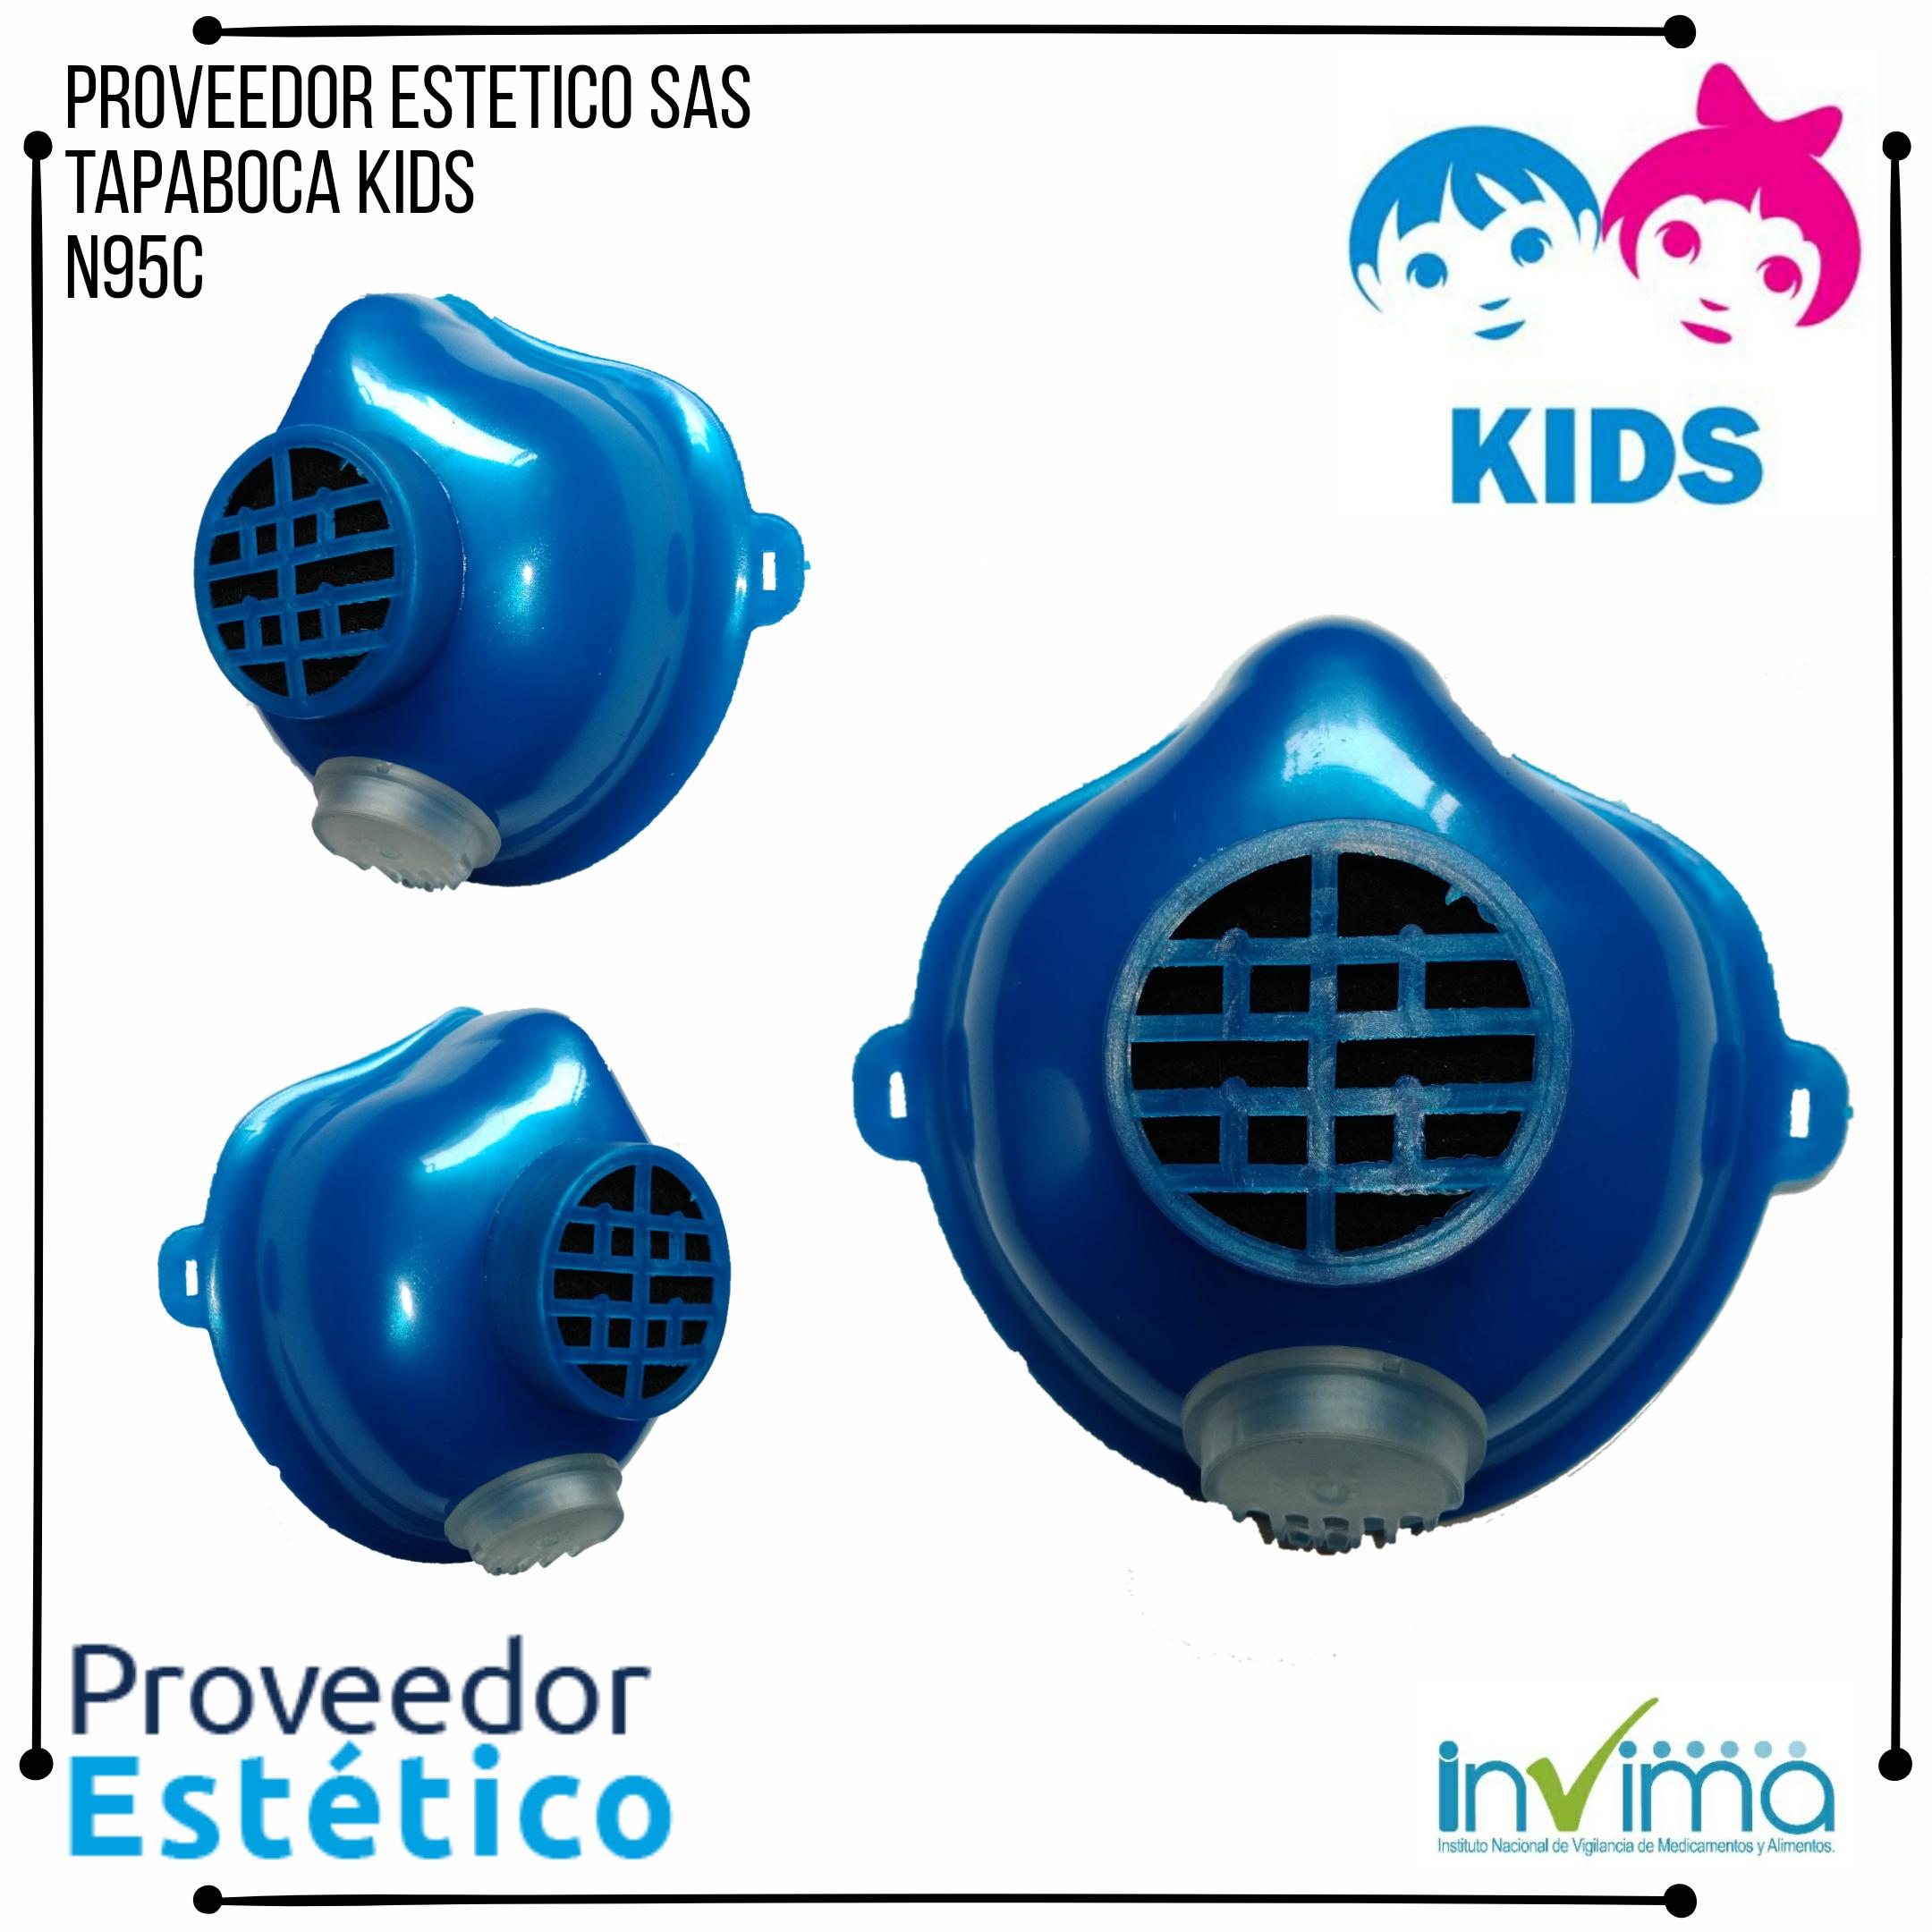 https://0201.nccdn.net/1_2/000/000/152/623/Tapaboca-N95-Kids_4.png